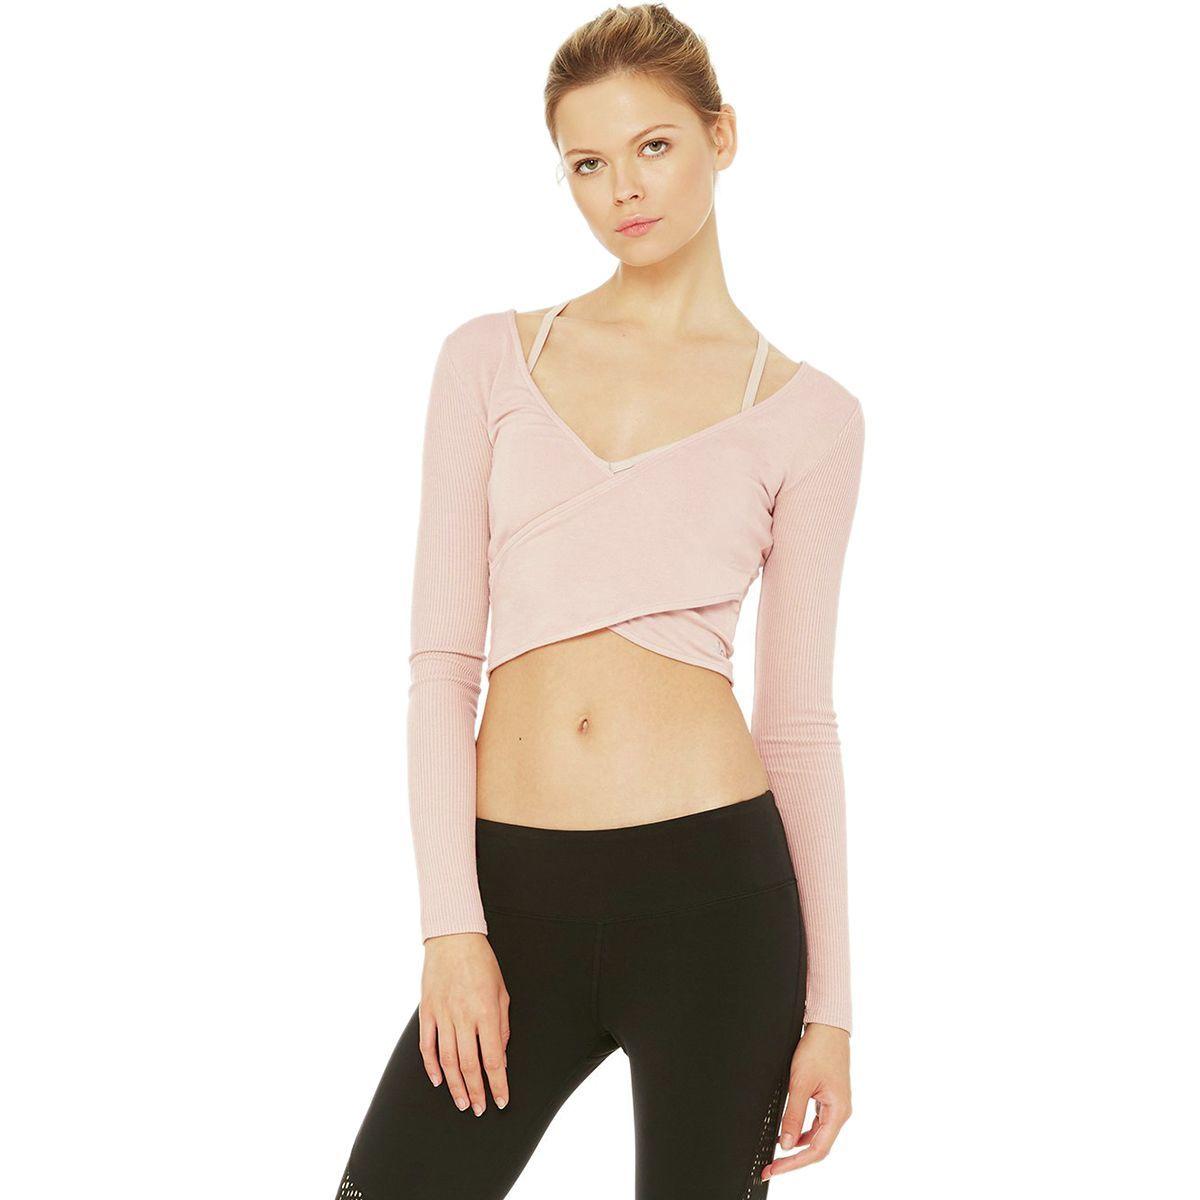 Alo Yoga Amelia Crop Shirt - Women's